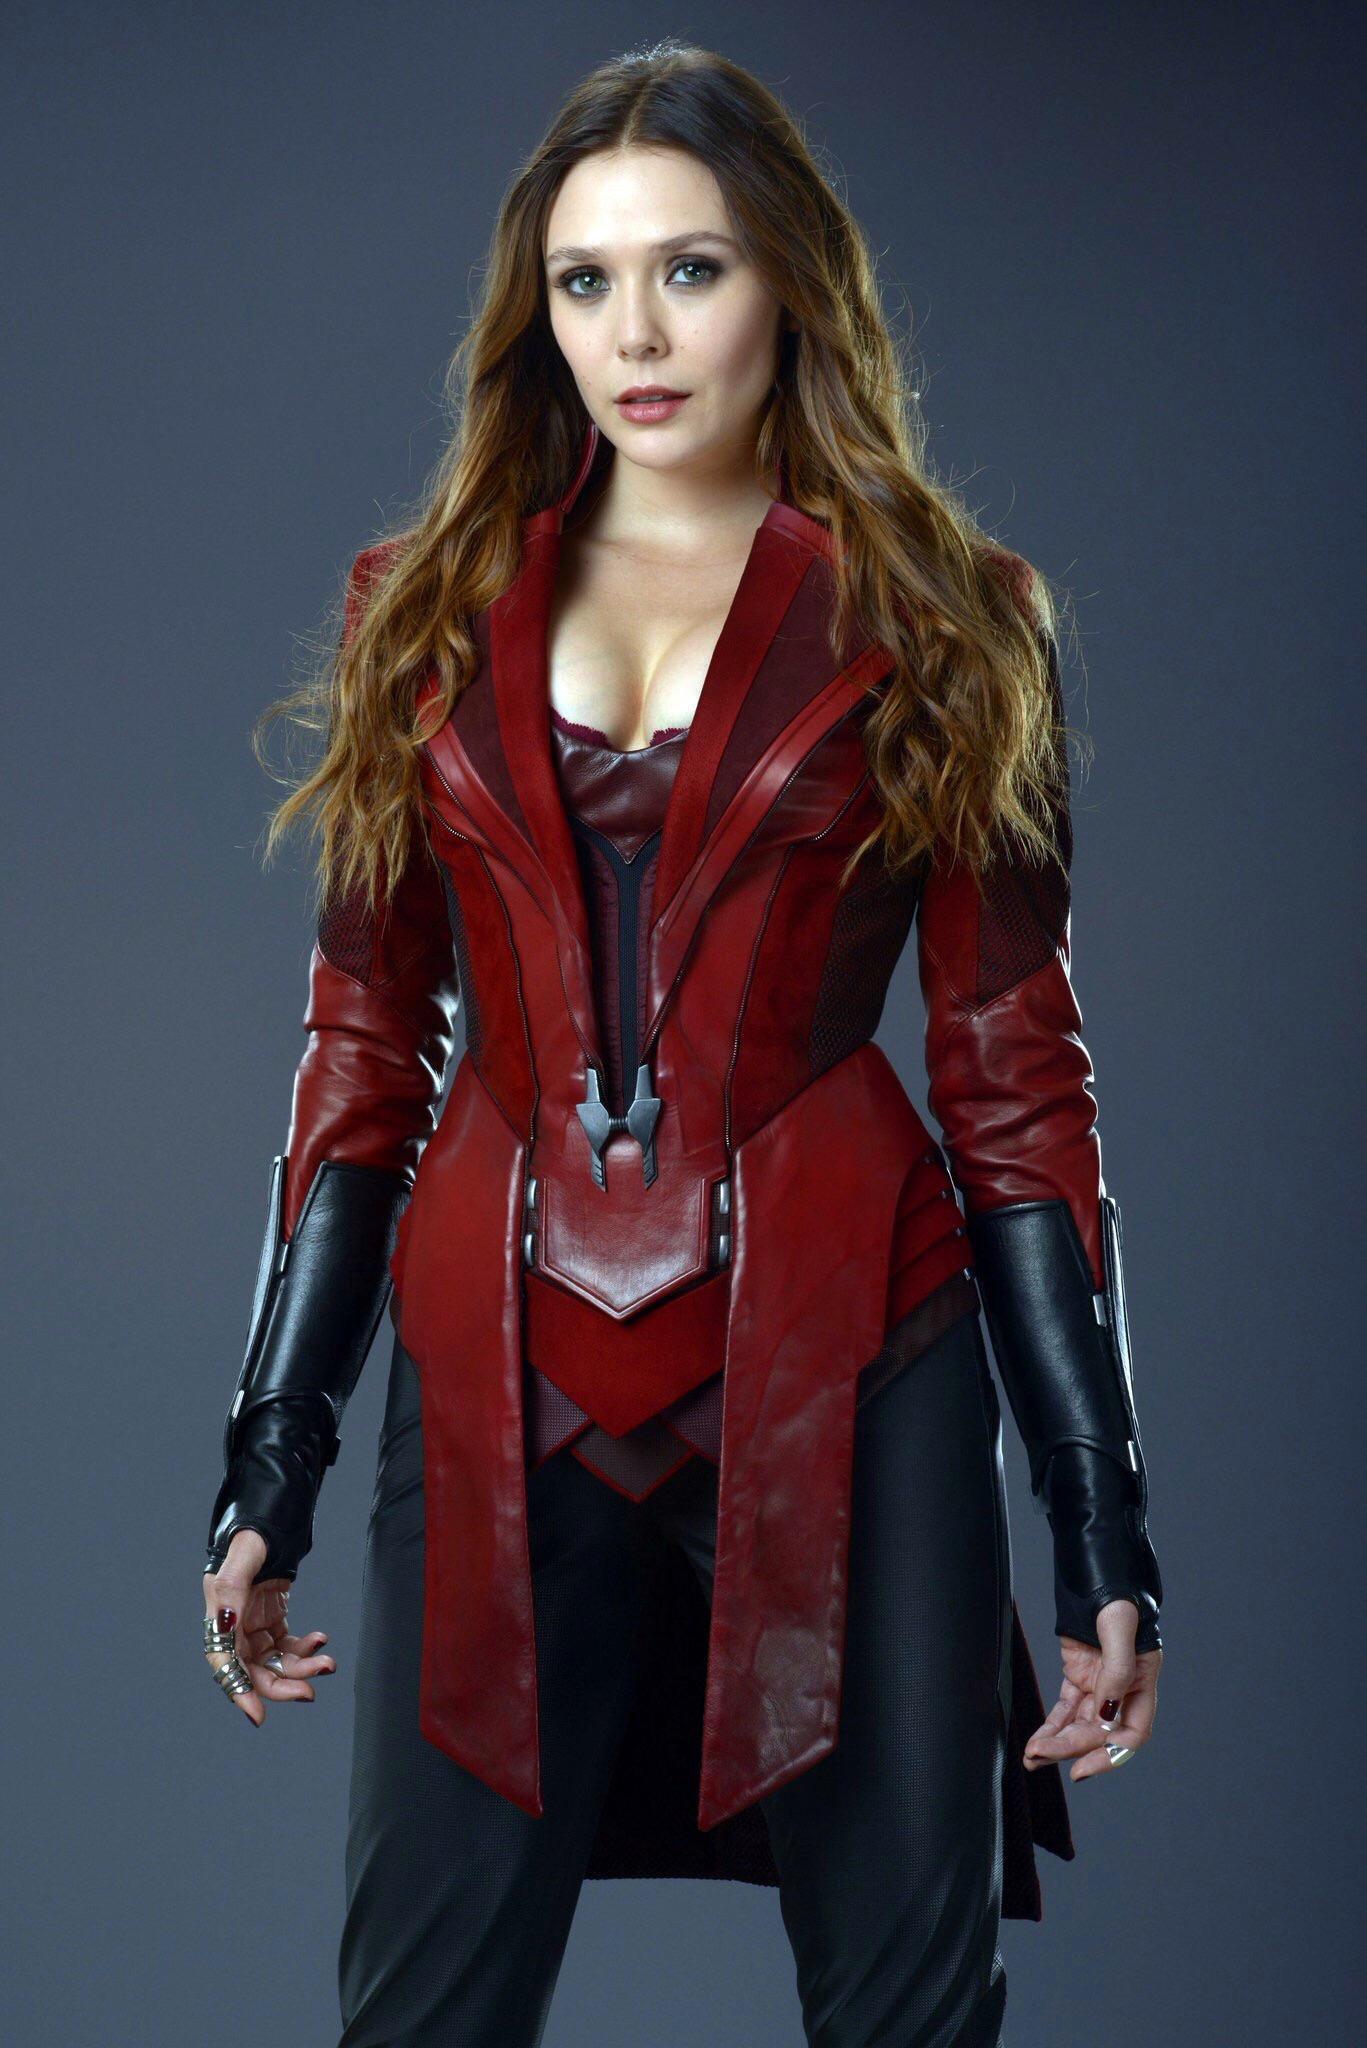 Scarlet_Witch_Wanda-Age_Of_Ultron.jpg